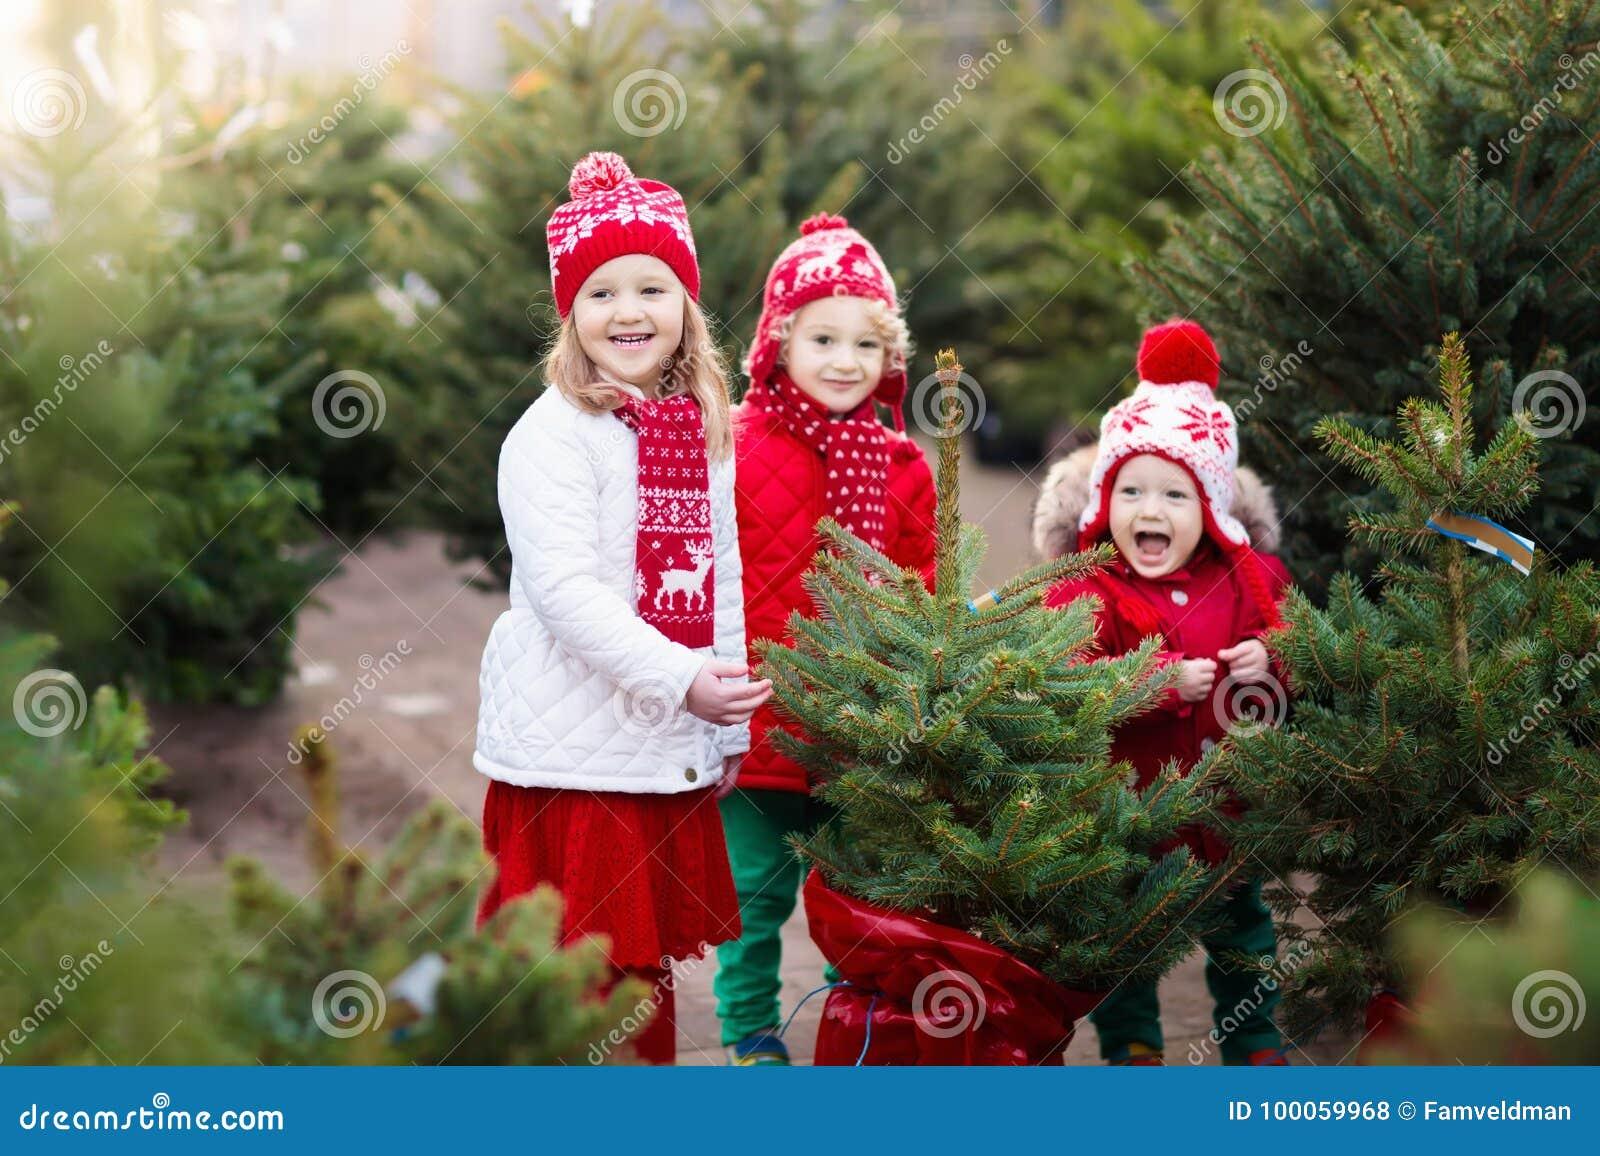 Kids Selecting Christmas Tree. Xmas Gifts Shopping. Stock Photo ...